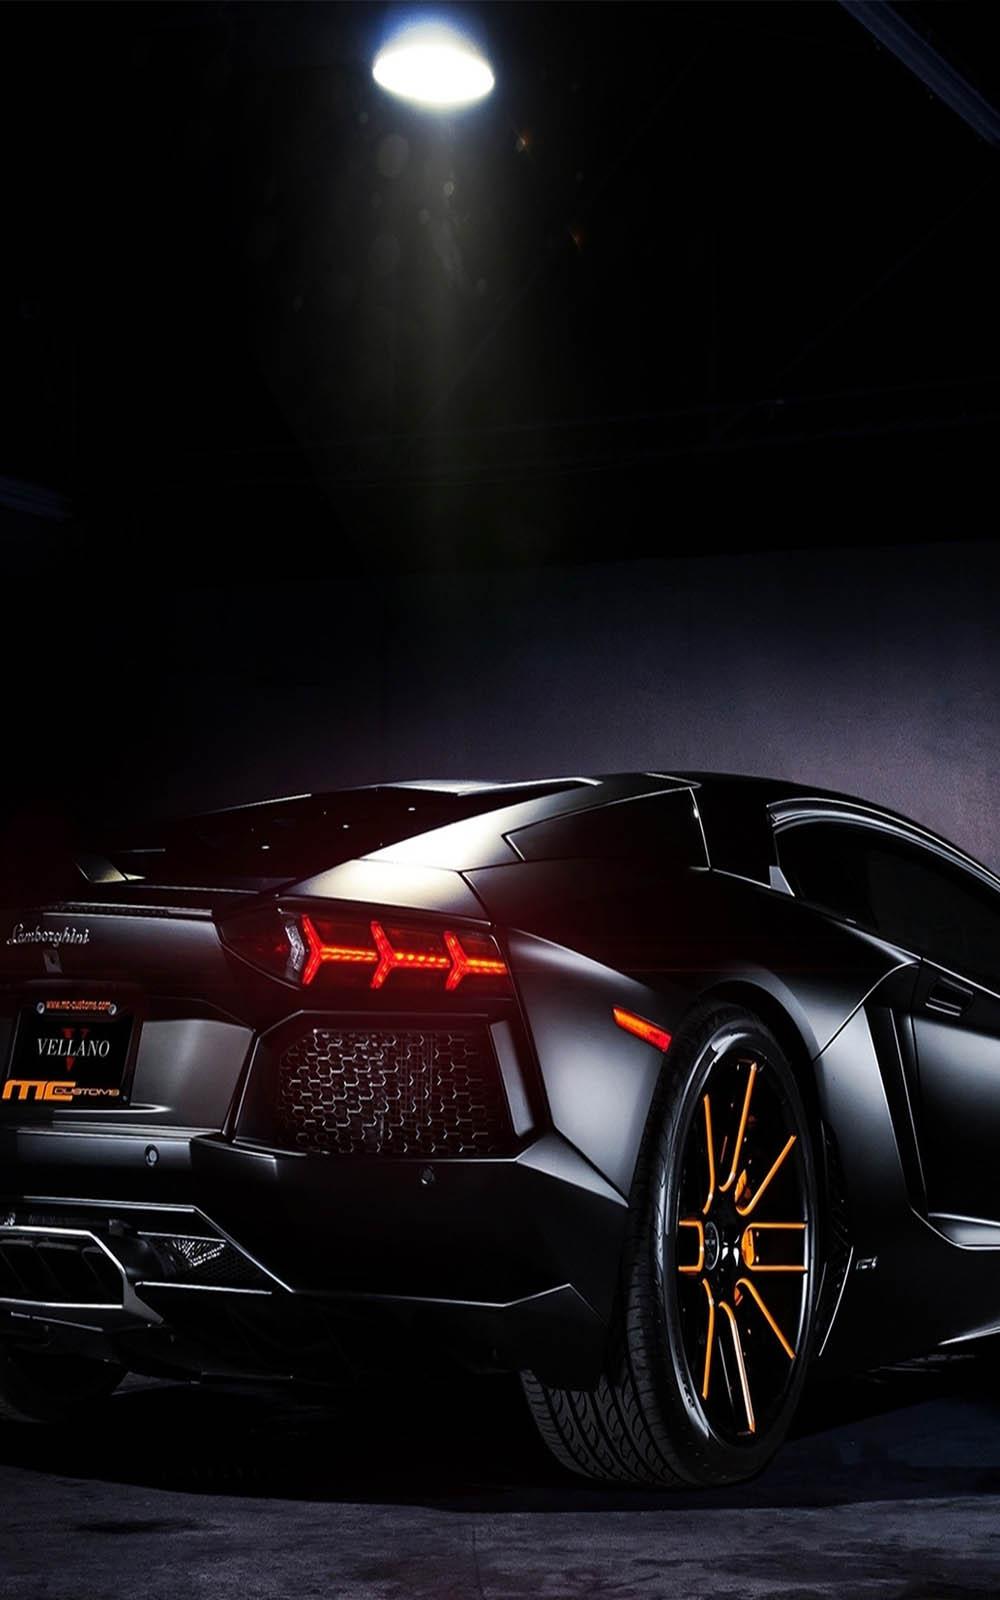 Lamborghini Wallpapers Hd For Mobile Babangrichie Org